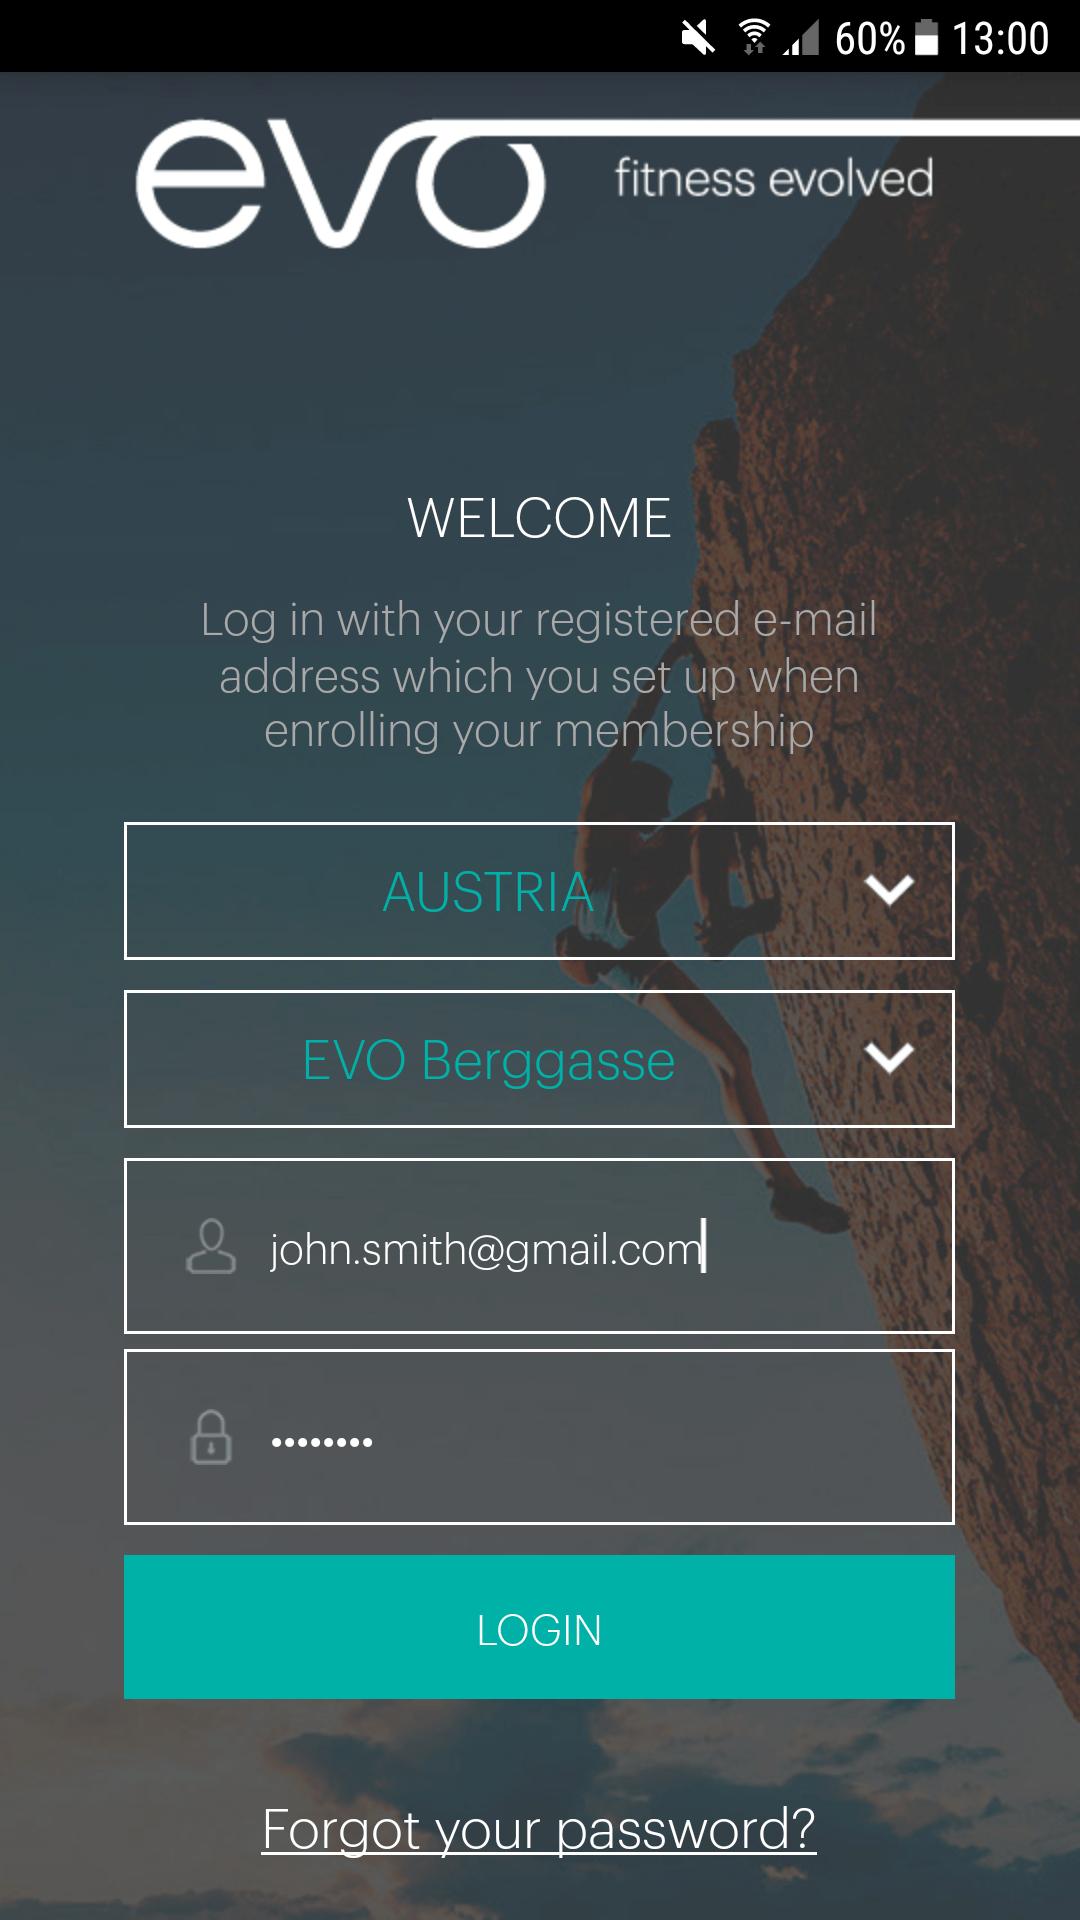 New App Login